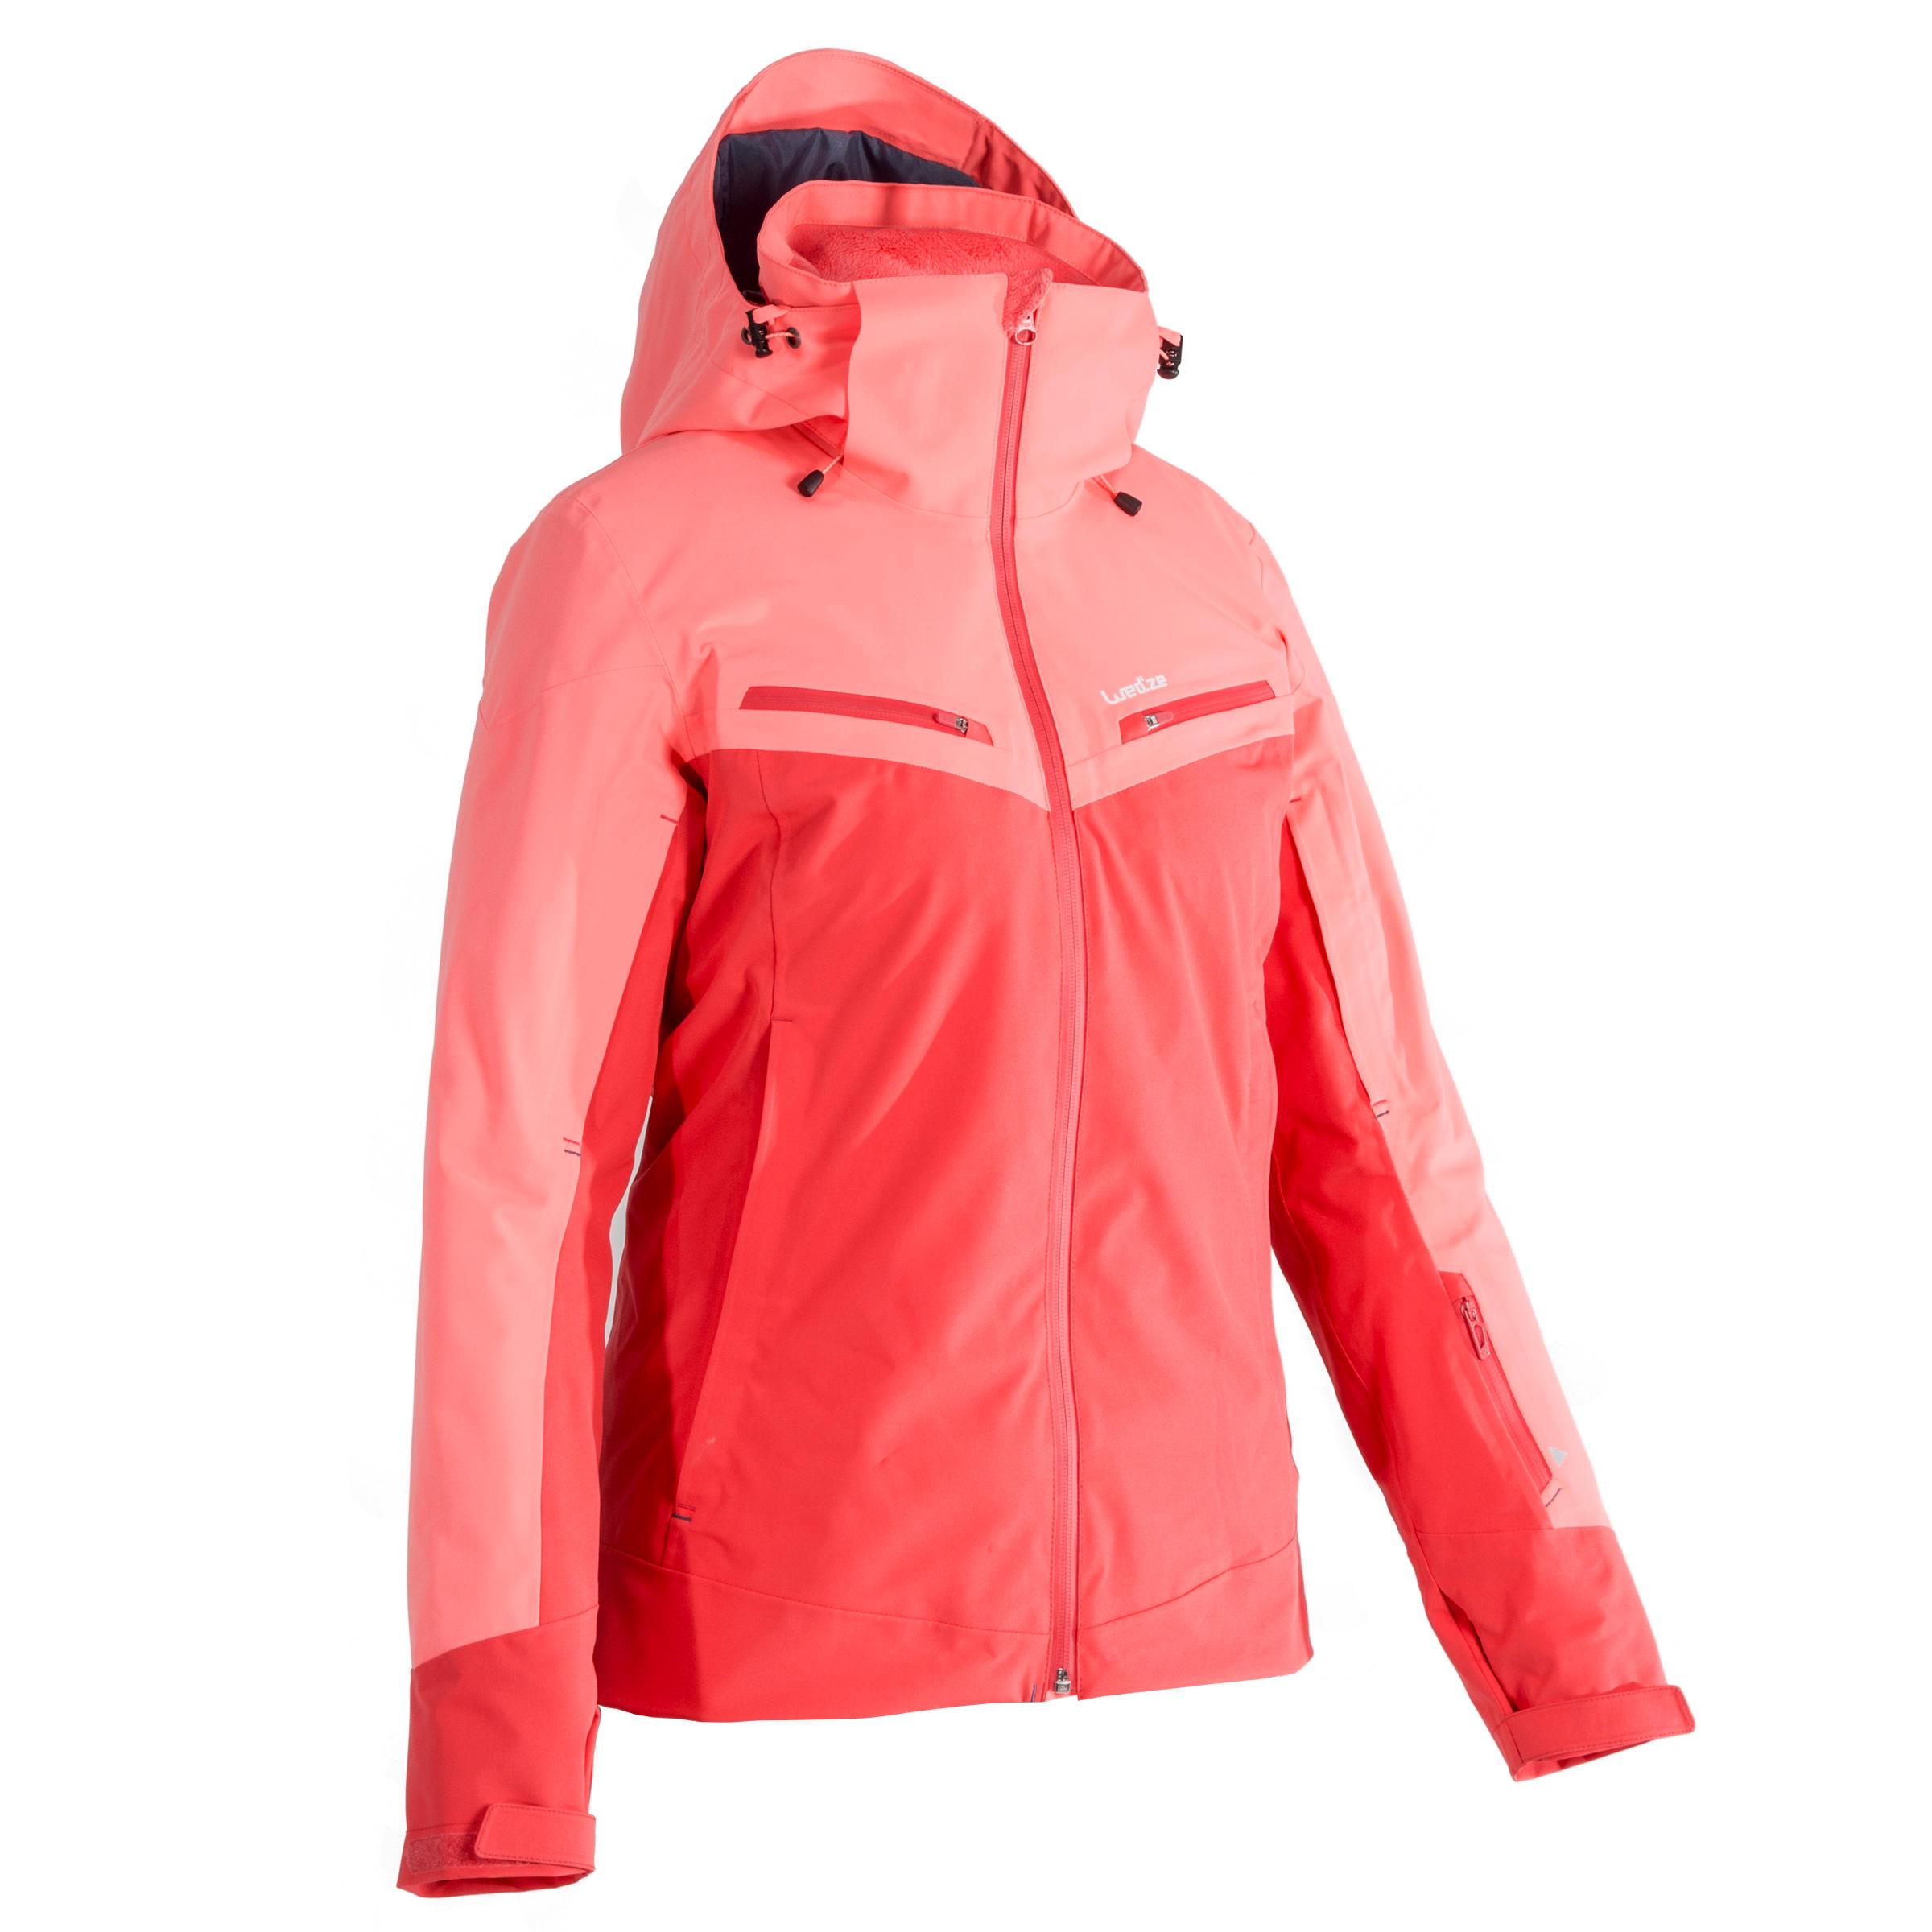 Damen Skijacke All Mountain 900 Damen koralle | 03608449859493